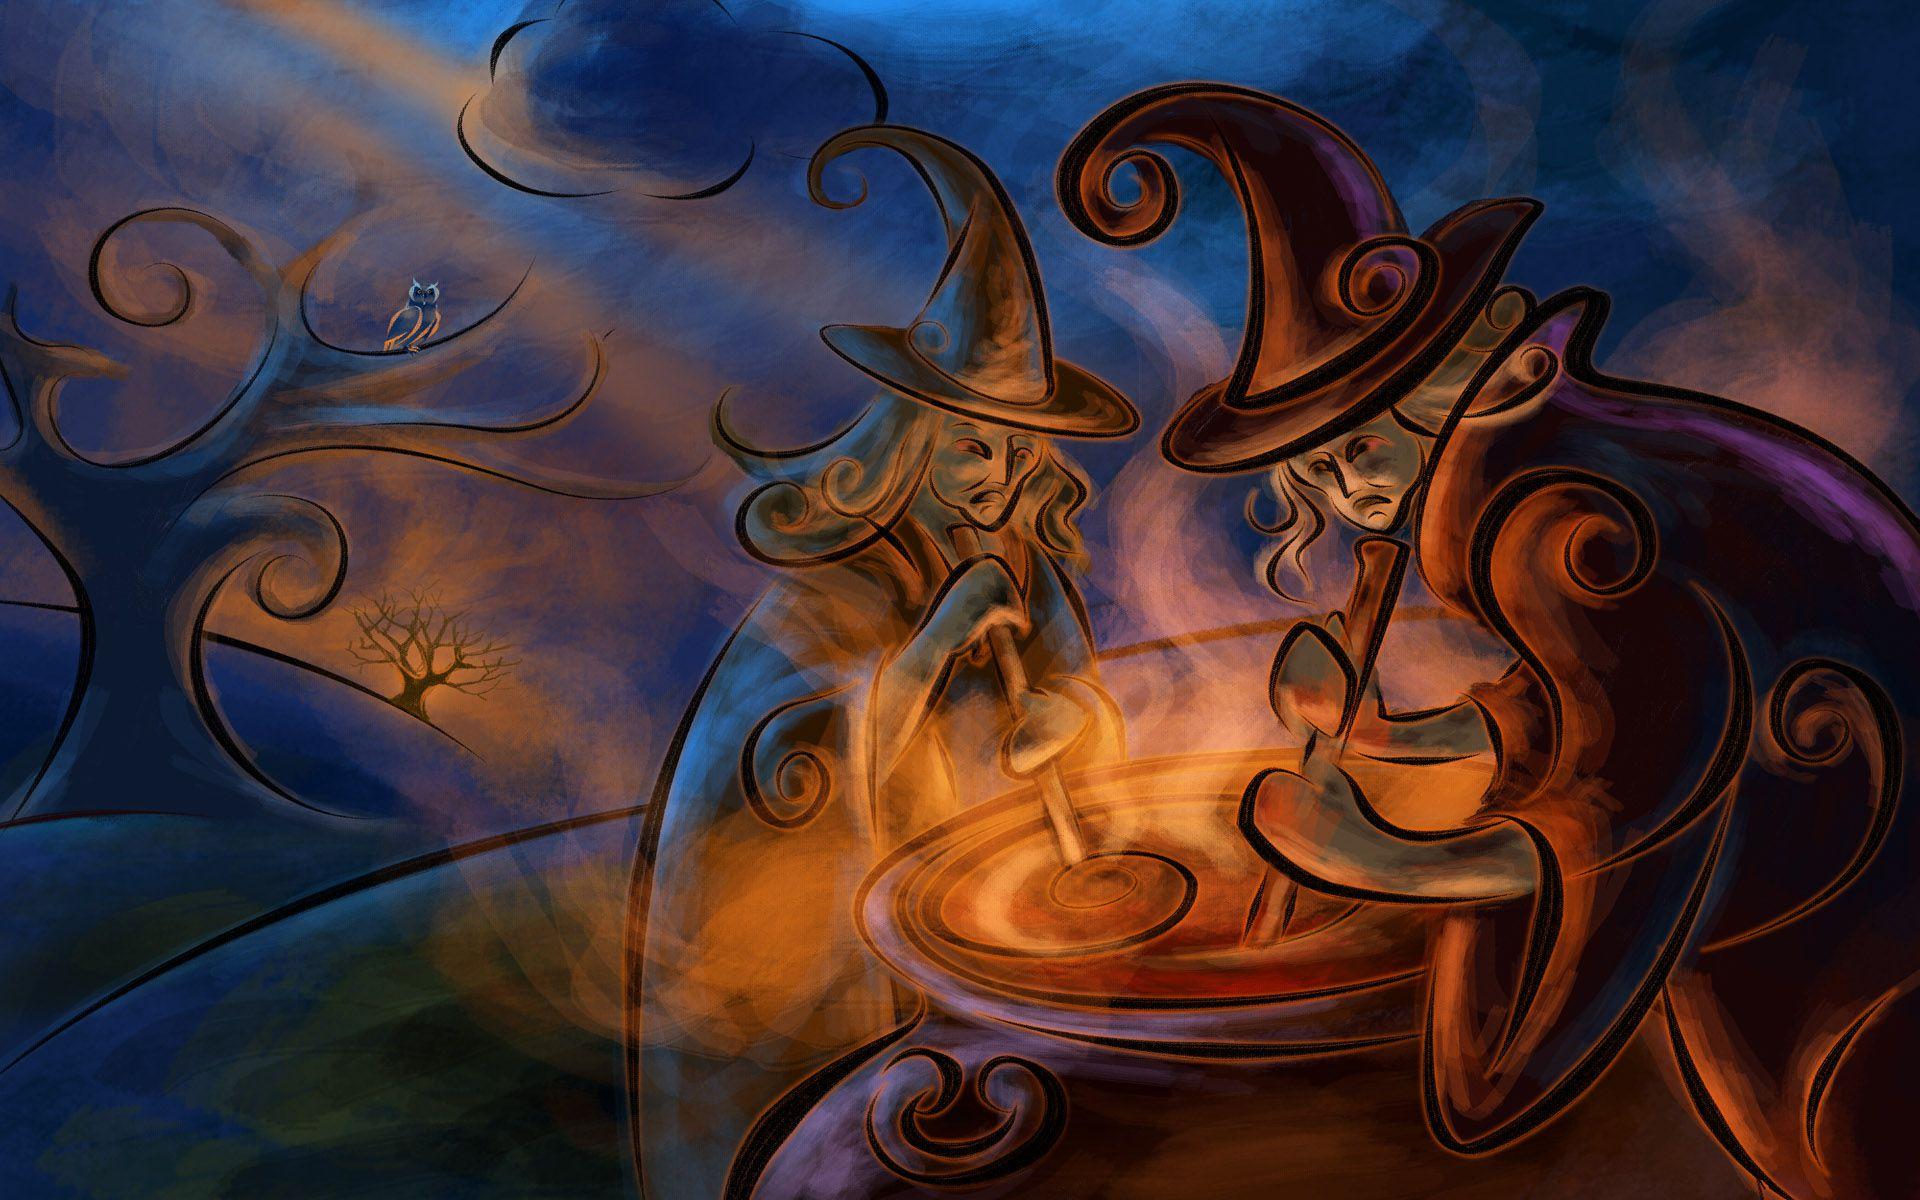 43 spooky and fun halloween wallpapers - Halloween Wallpapaer